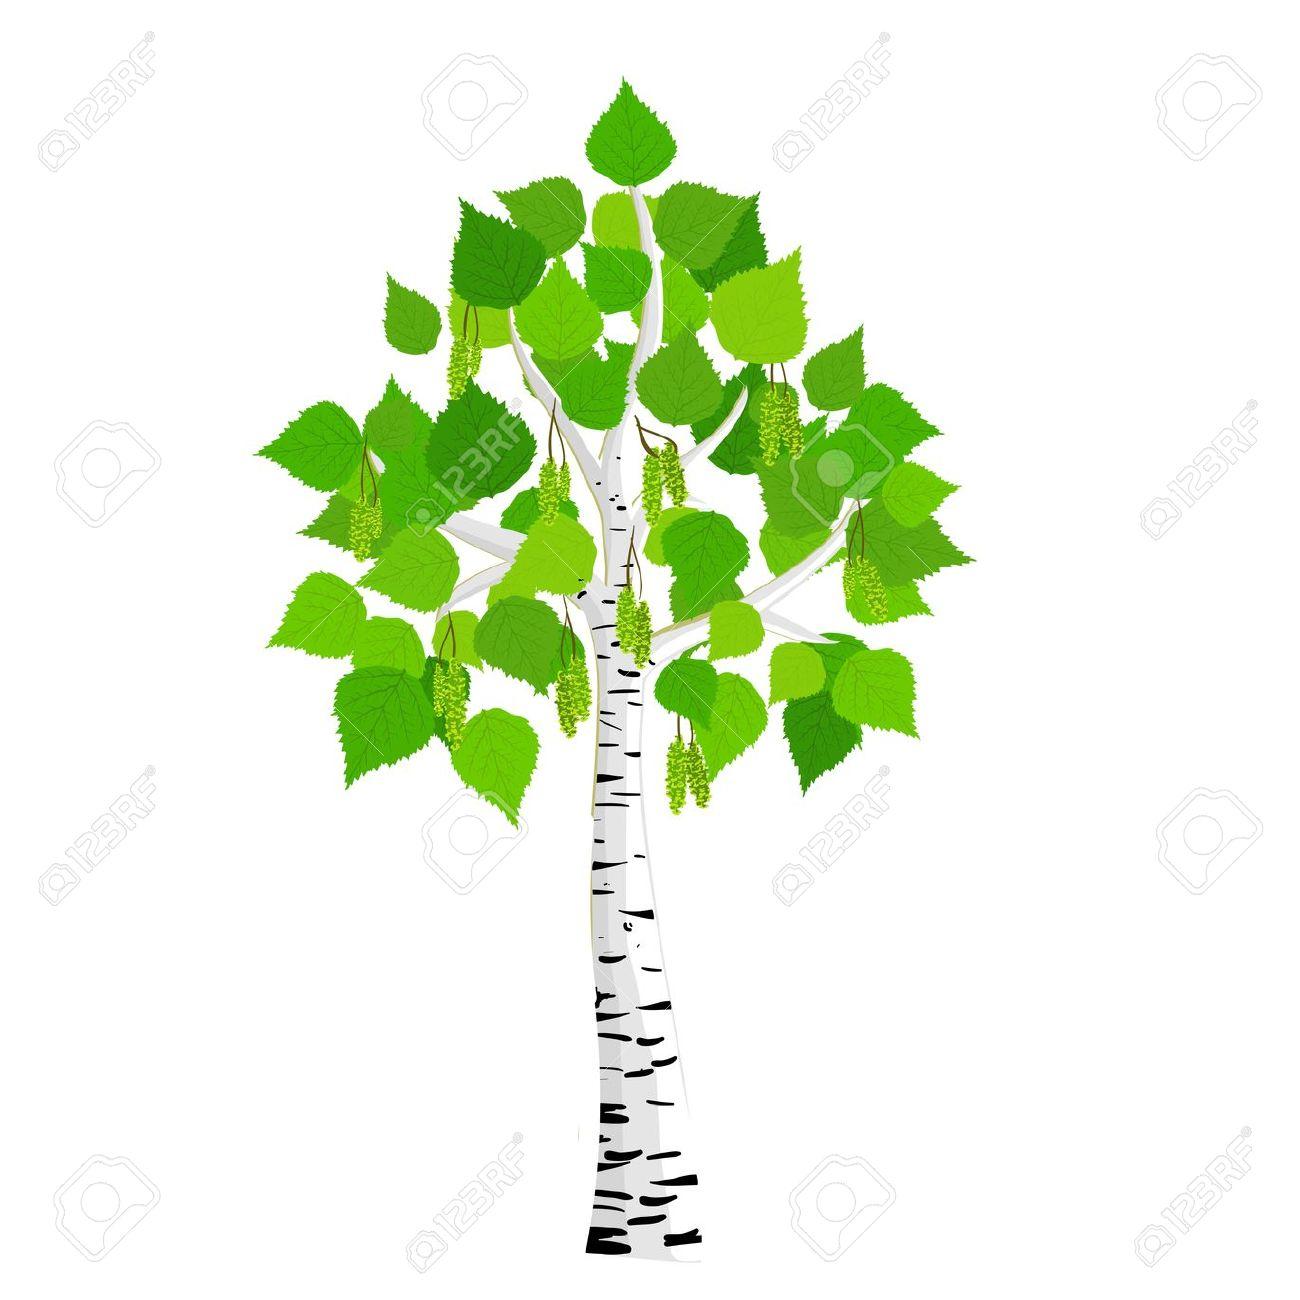 birch tree: birch tree